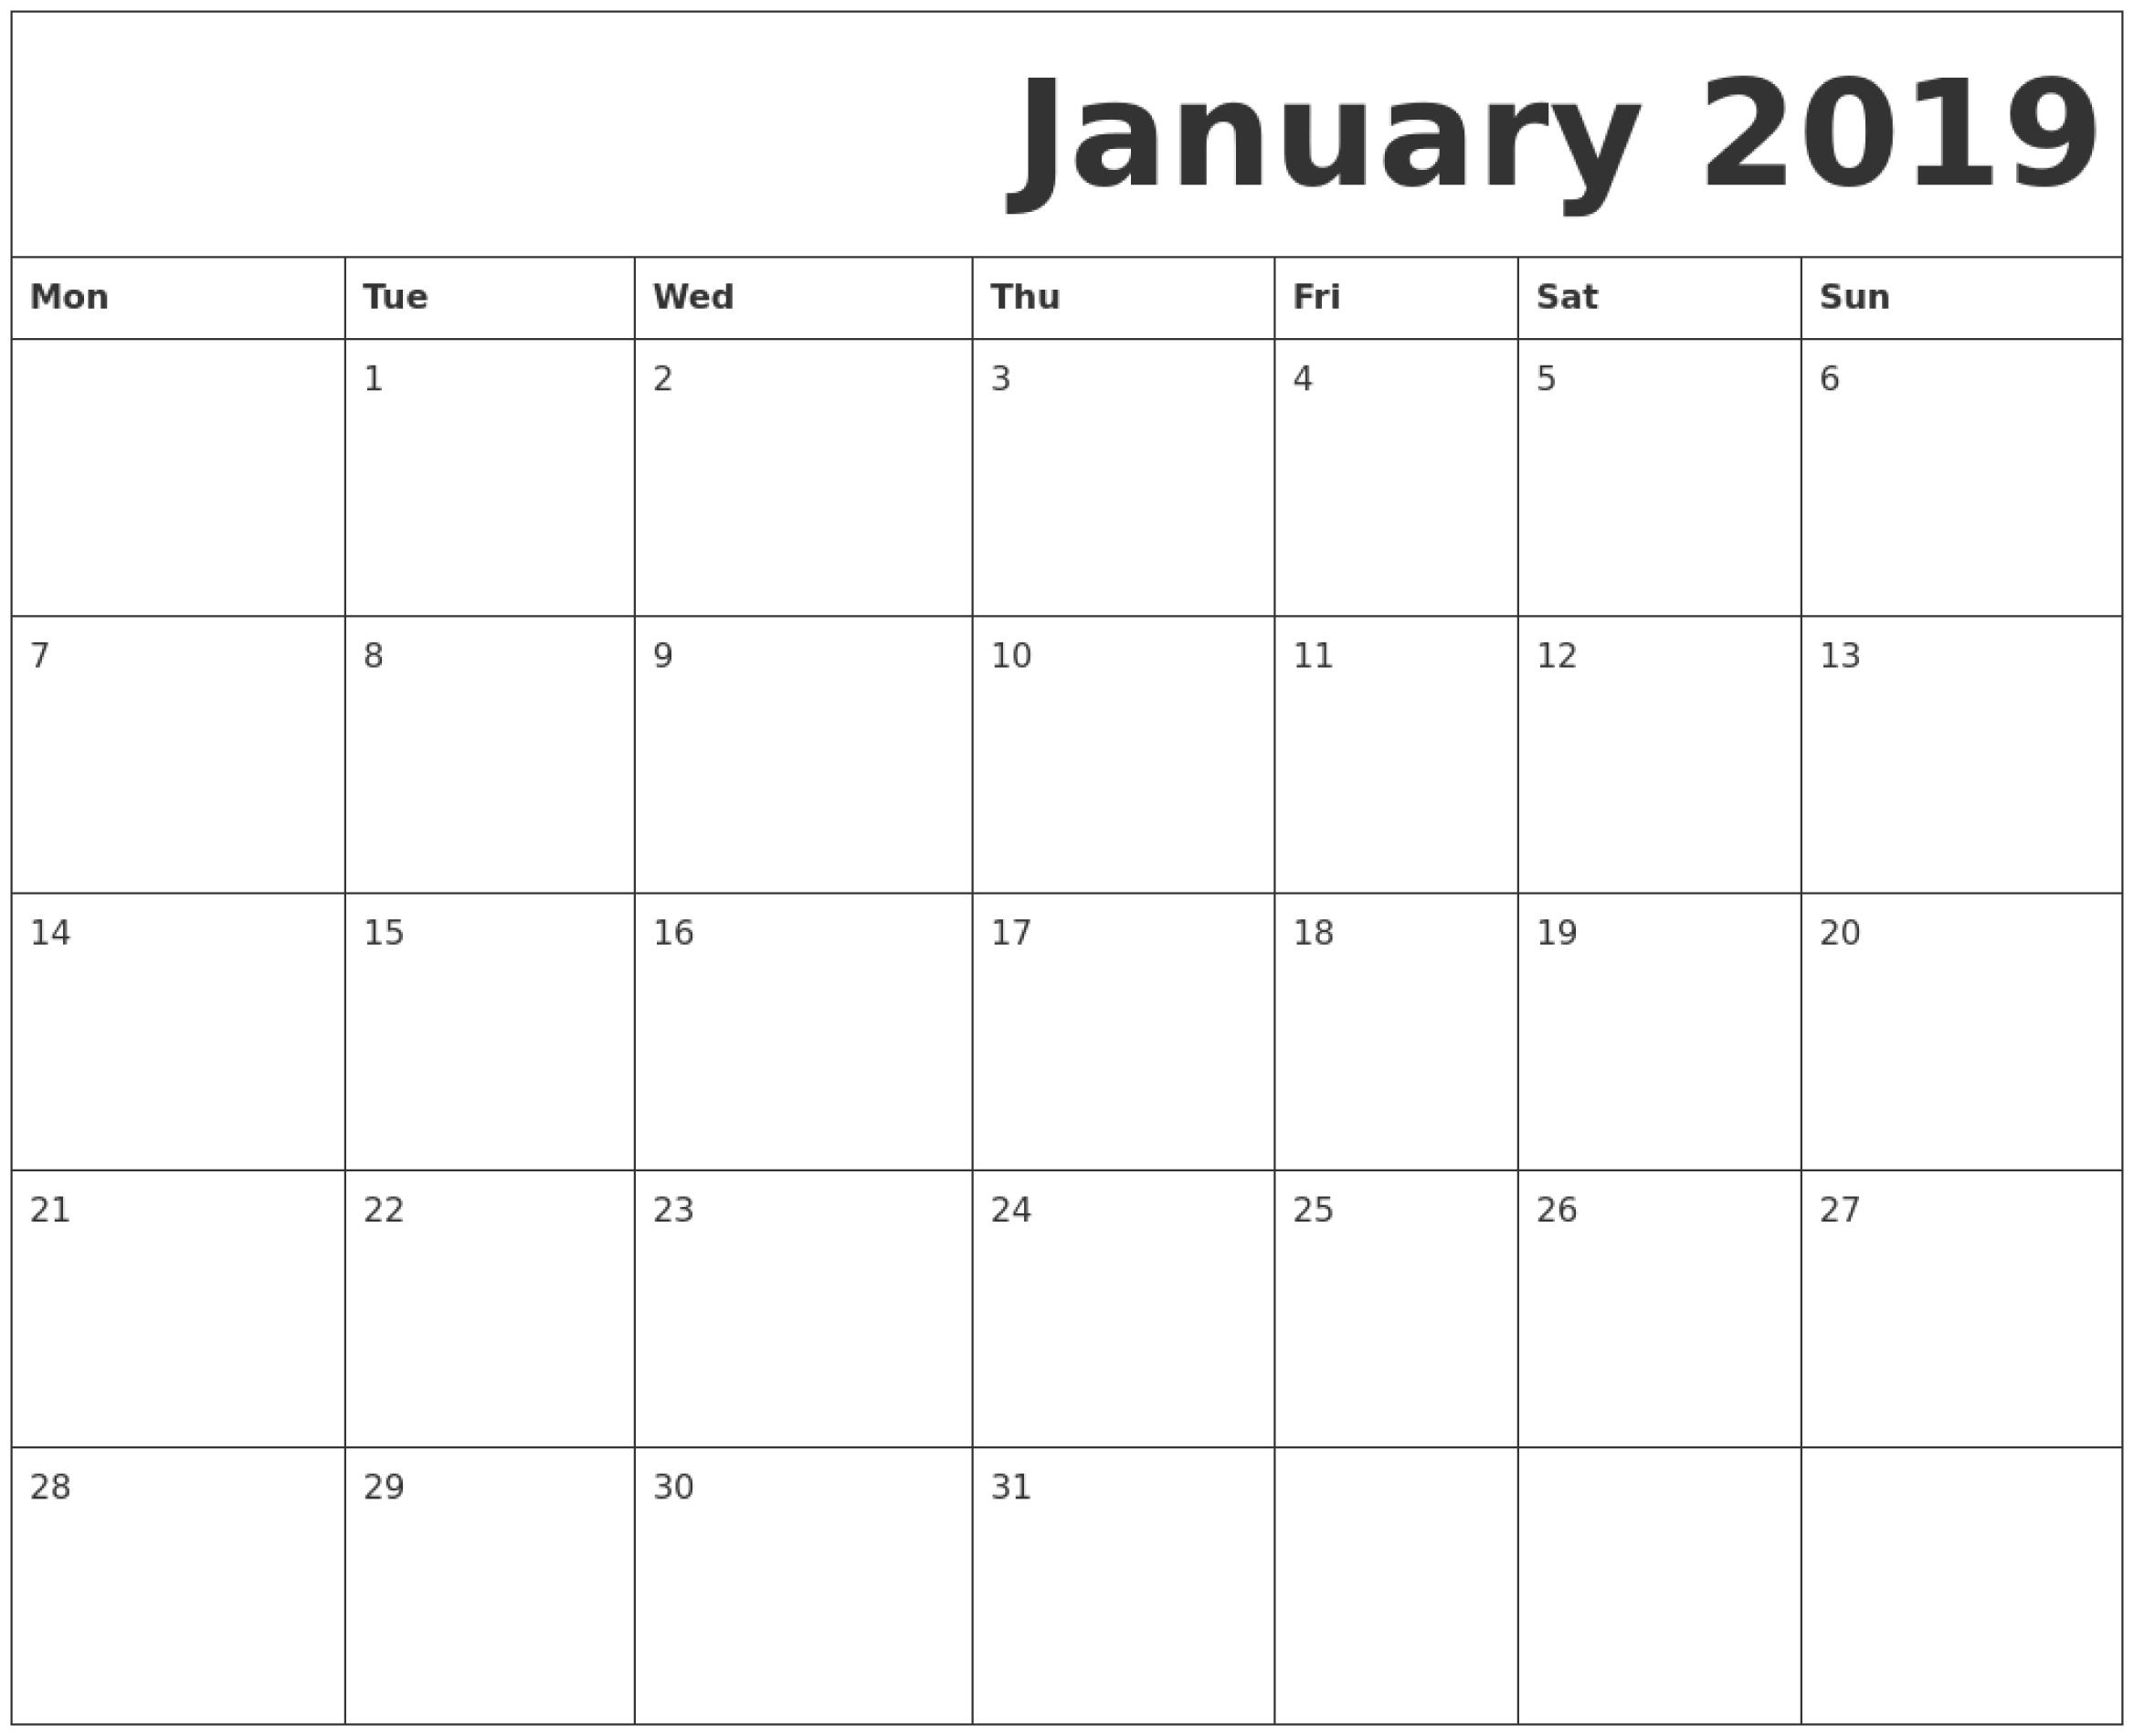 January 2019 Printable Calendar Monday Start. | January 2019-Printable Monthly Calendar Starting On Monday